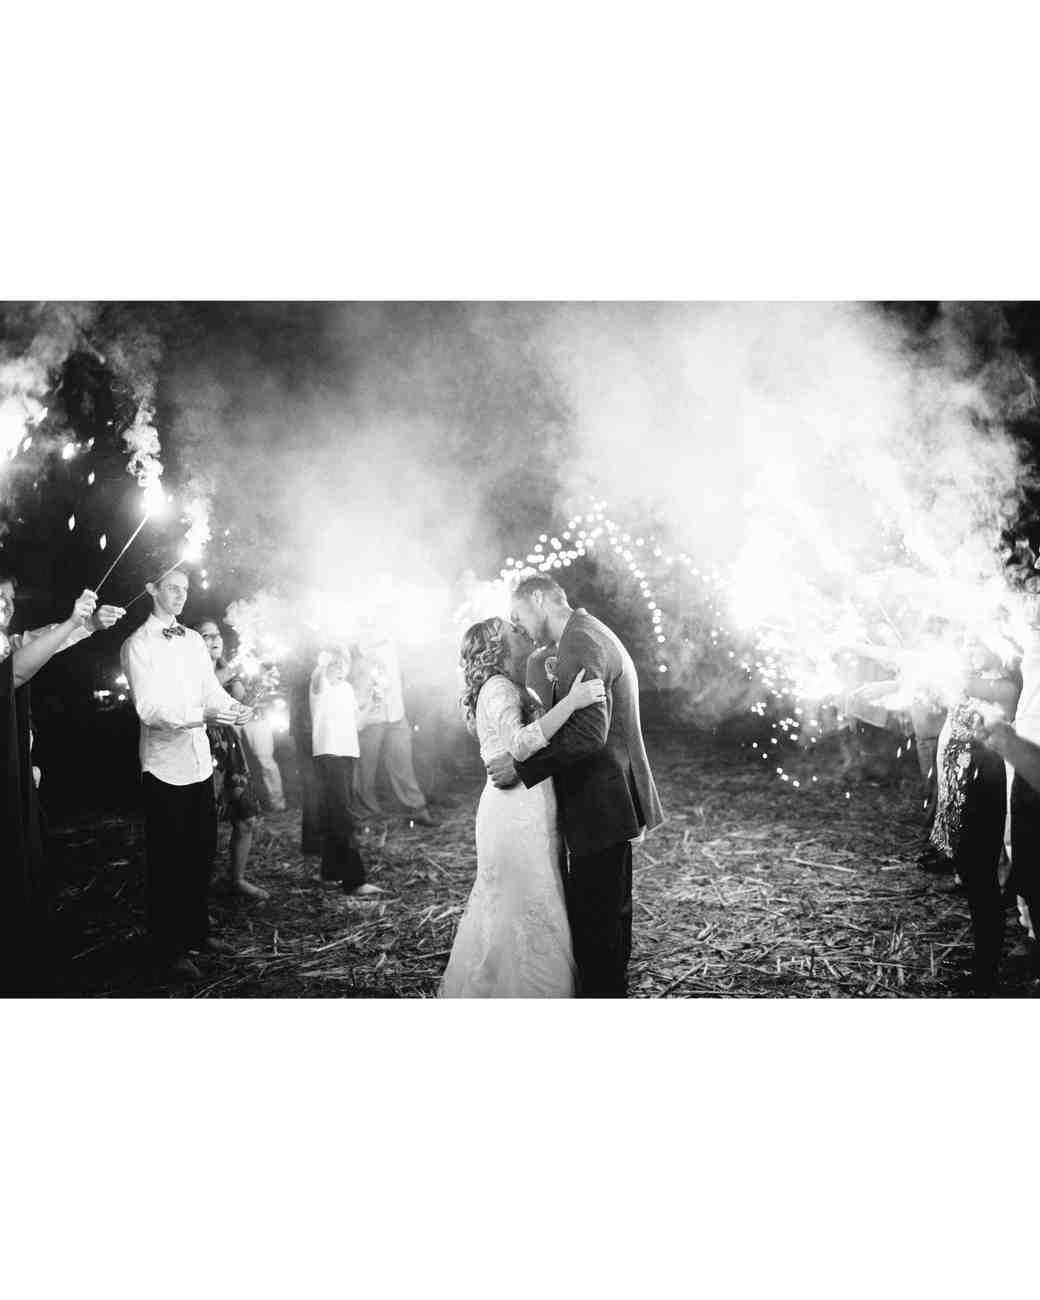 katie-nathan-wedding-sendoff-238-s113017.jpg